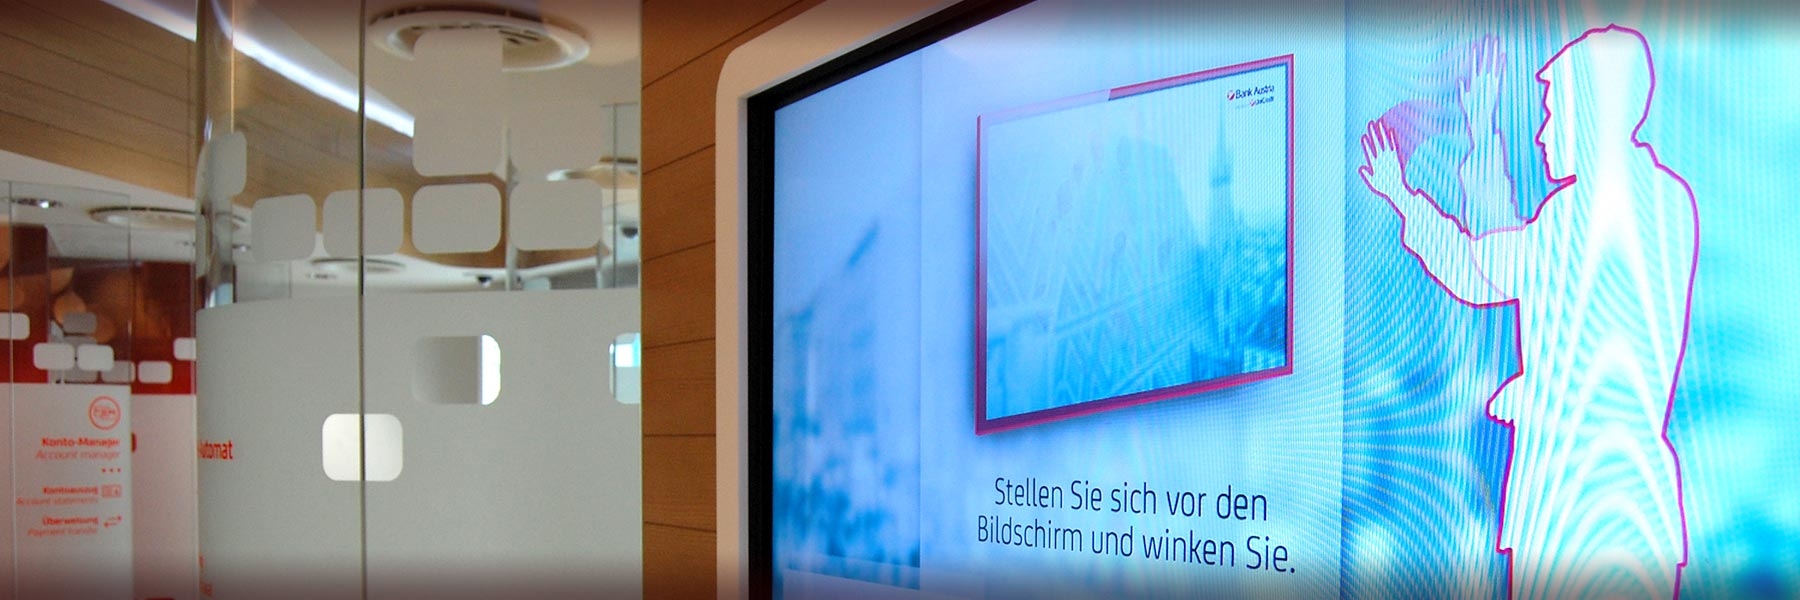 Bank Austria headquarters picture 4 - Foto 4 de la sede de Bank Austria